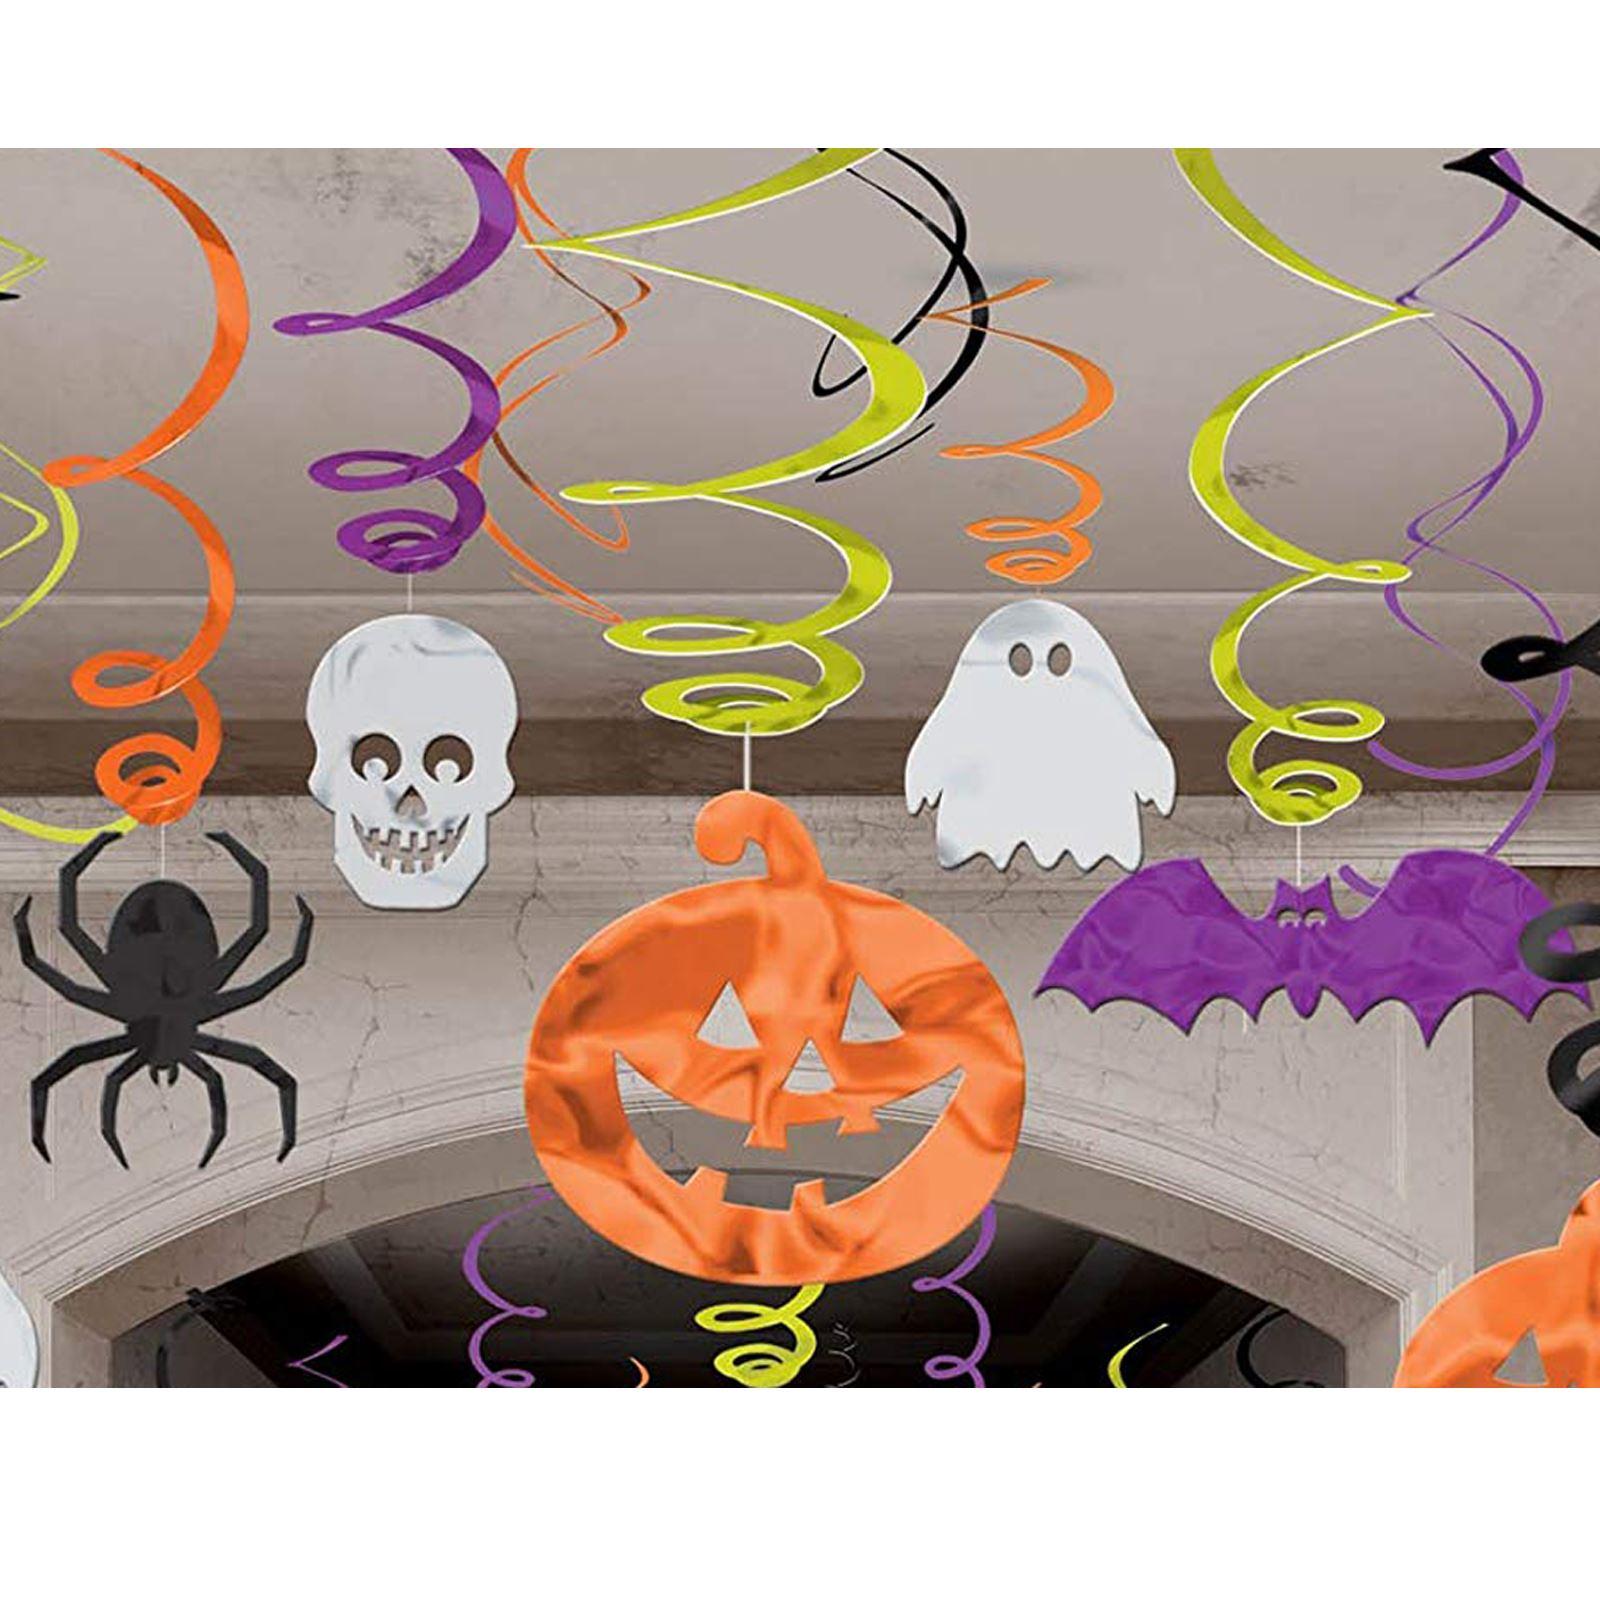 10 PACK FOIL SWIRL DECORATIONS HALLOWEEN SPOOKY SPIDER SKULL GHOST PUMPKIN BATS